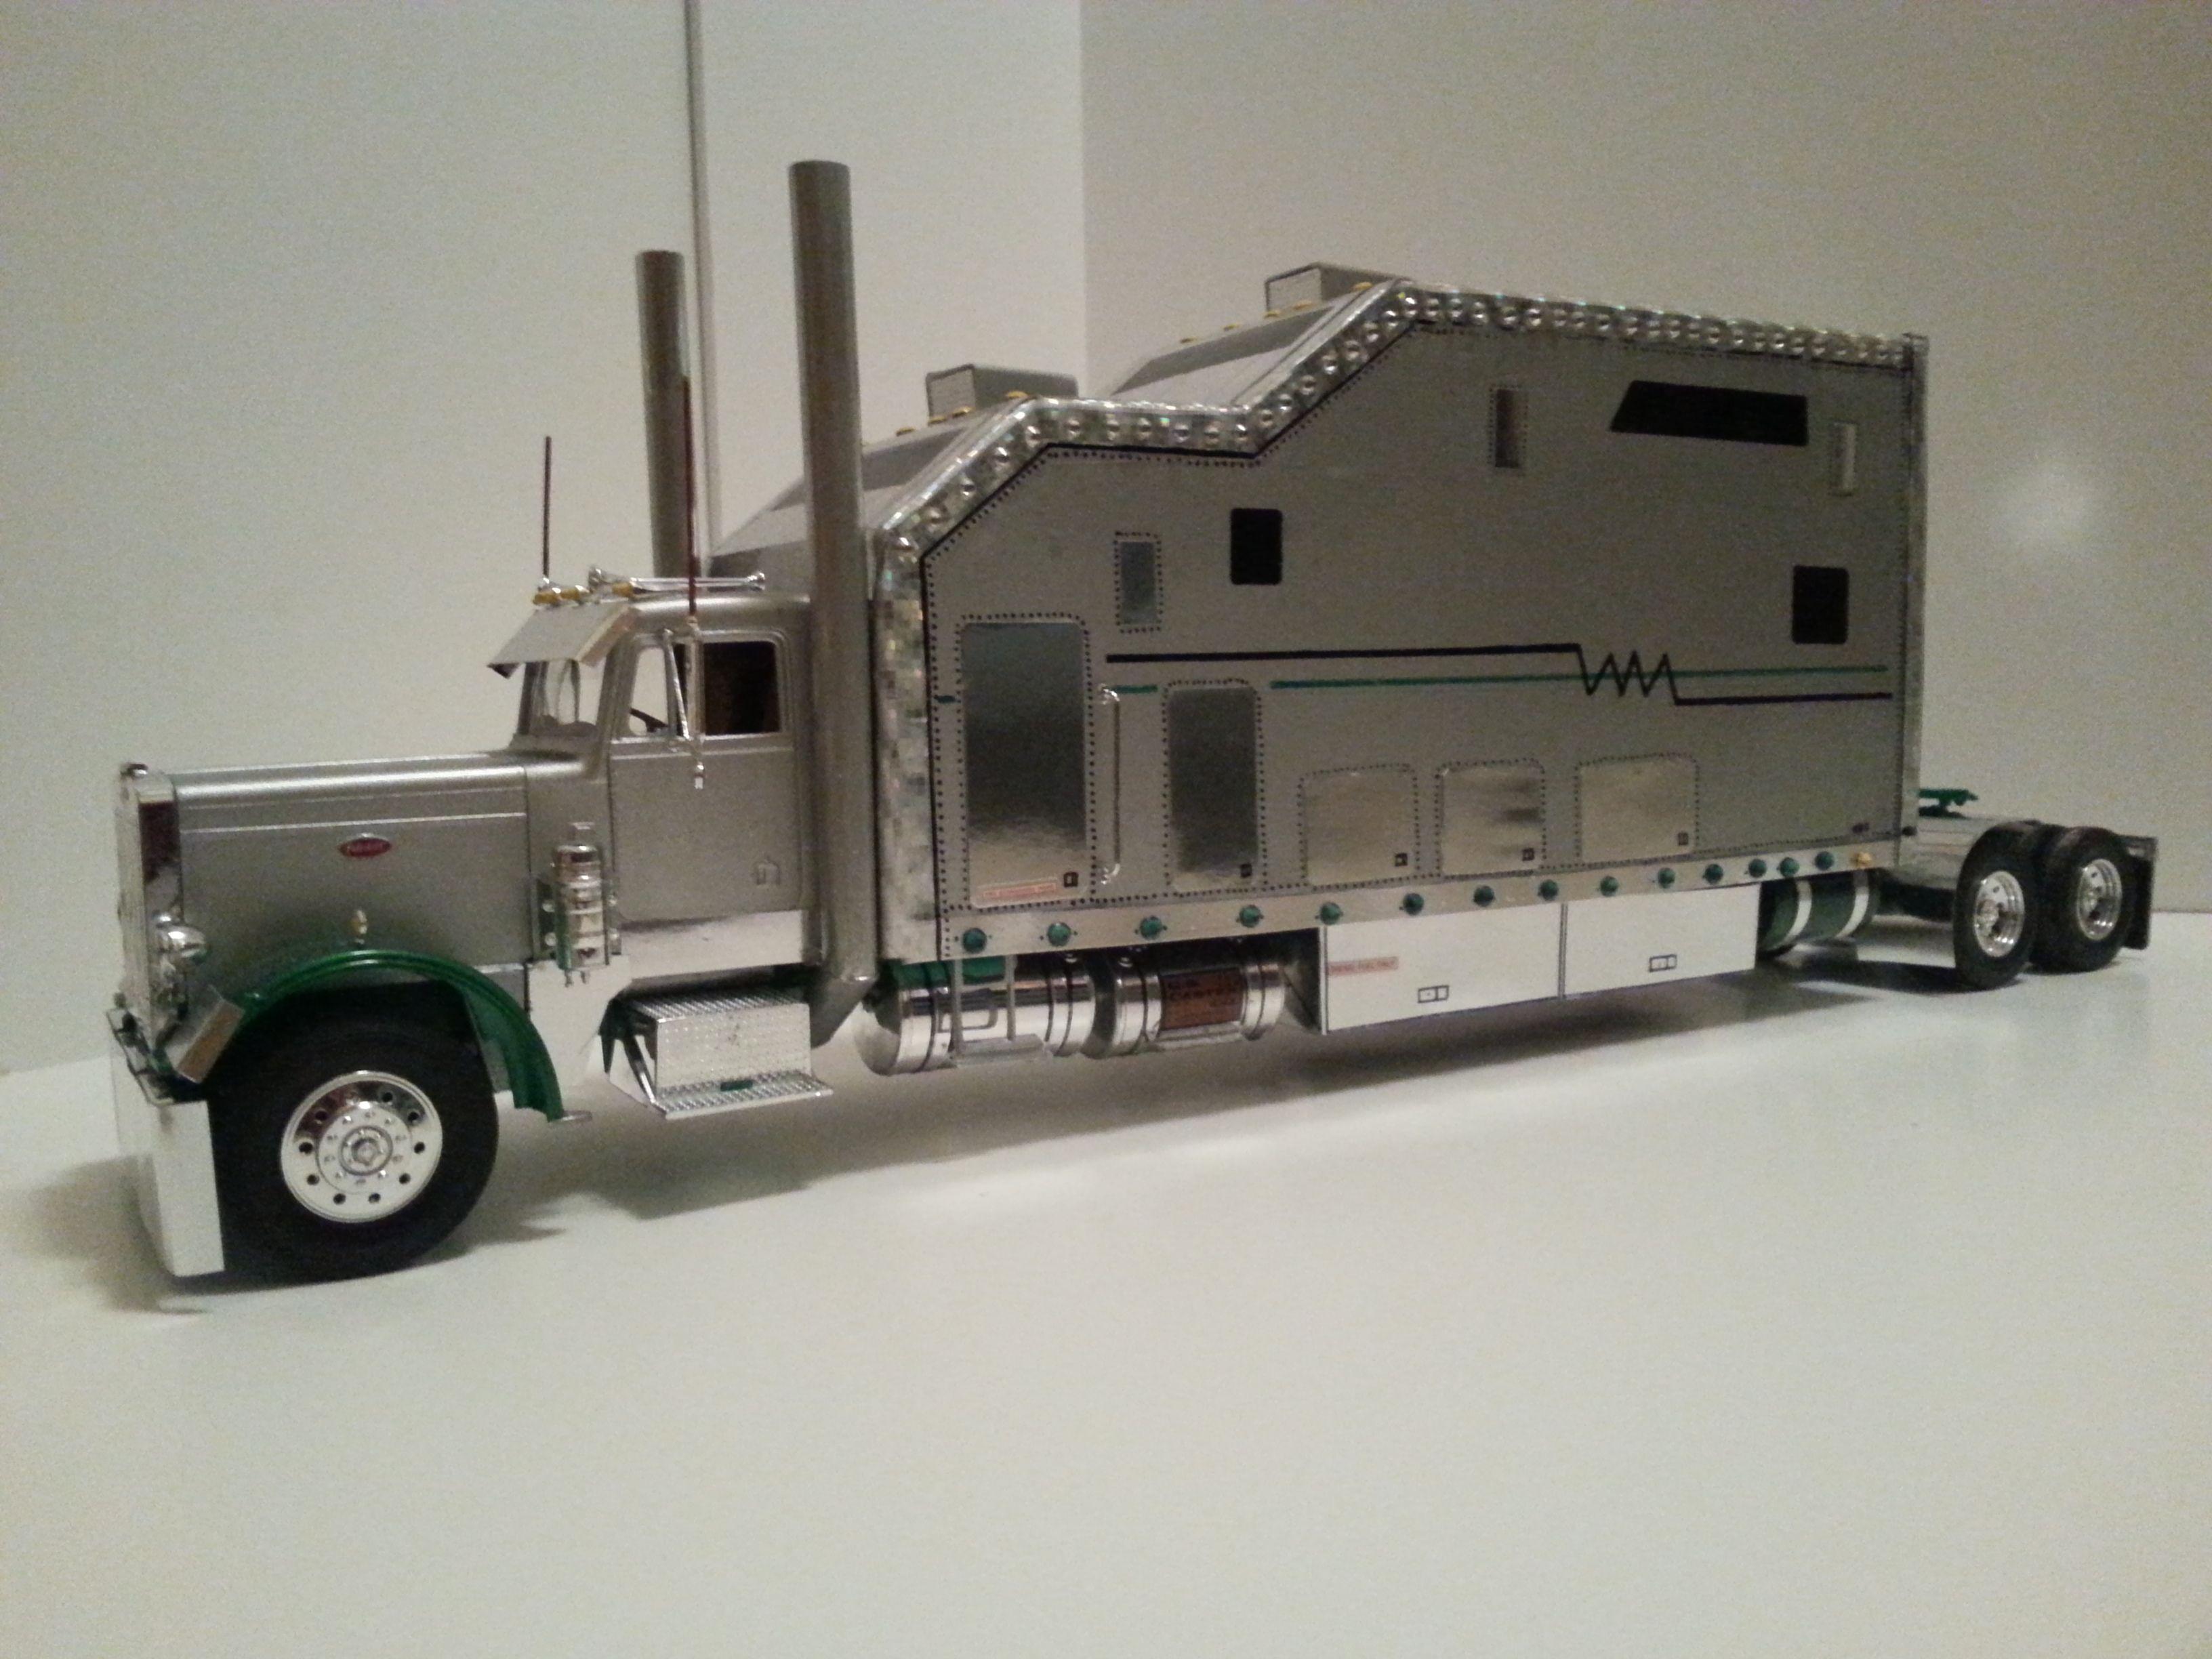 Imgenes de camiones de carga camiones pinterest rigs semi imgenes de camiones de carga camiones pinterest rigs semi trucks and biggest truck publicscrutiny Images